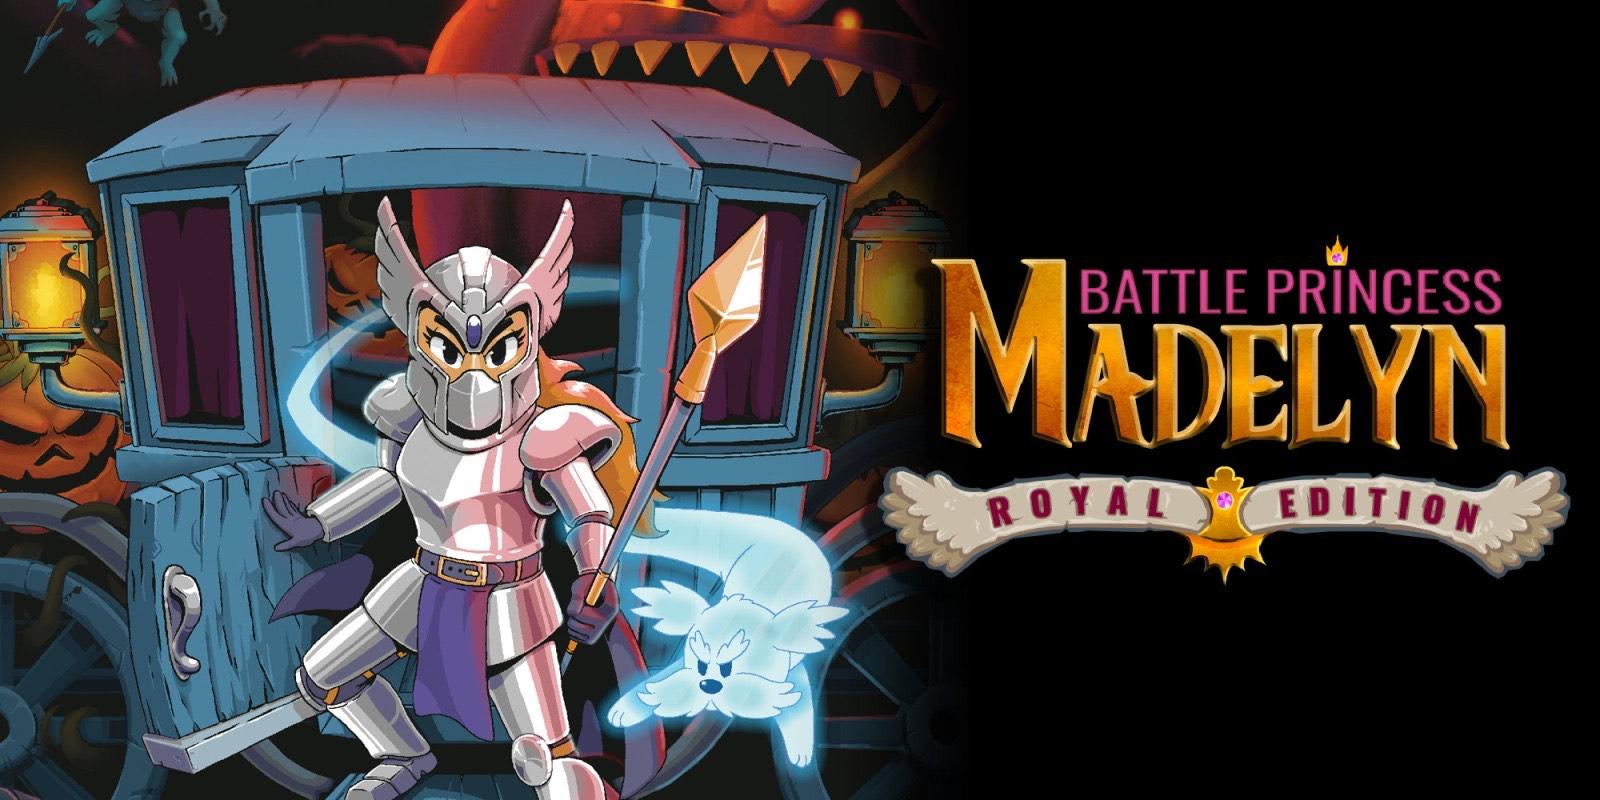 Battle Princess Madelyn Royal Edition Nintendo Switch eShop